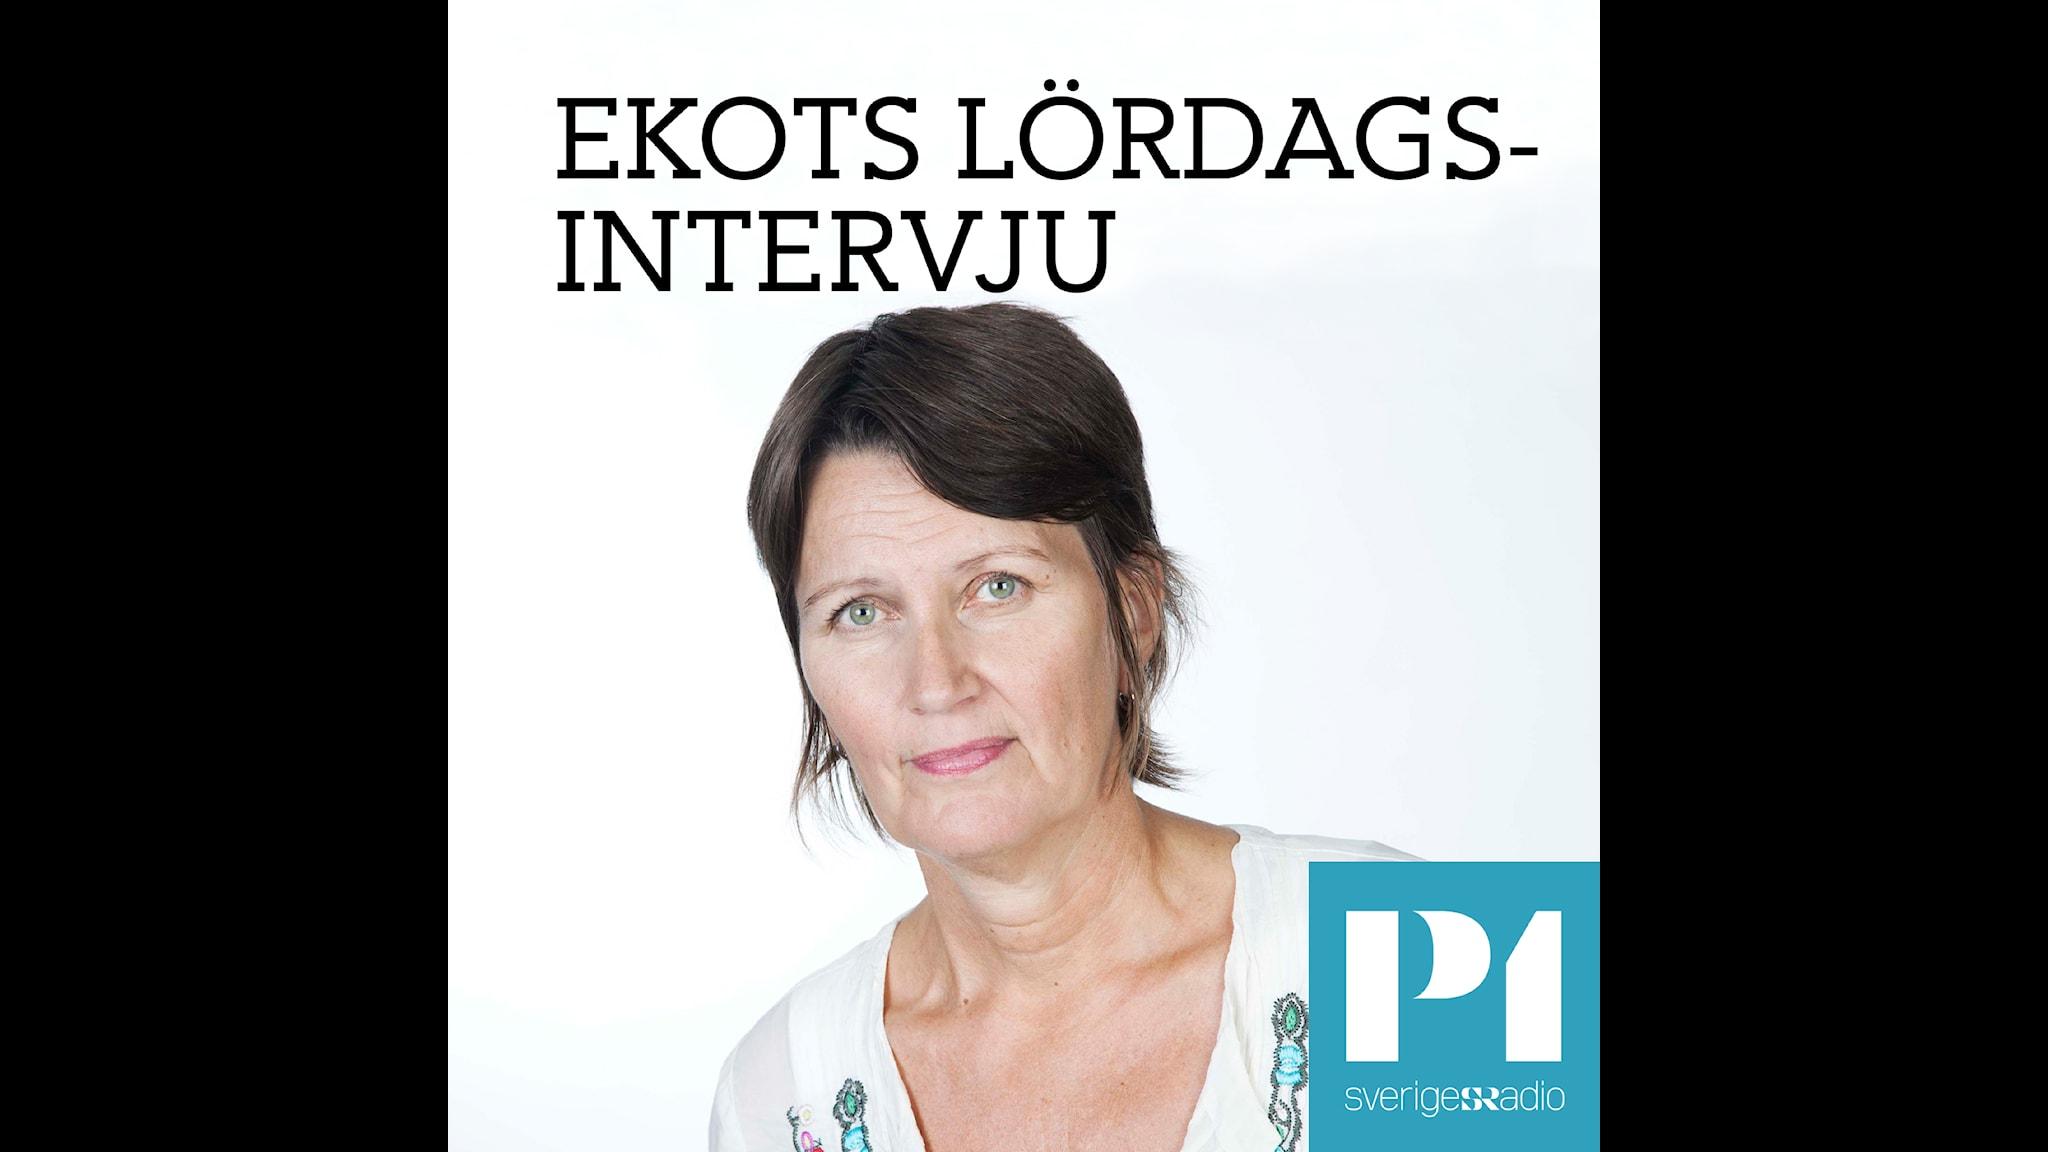 Ekots lördagsintervju Jimmie Åkesson (SD), partiledare